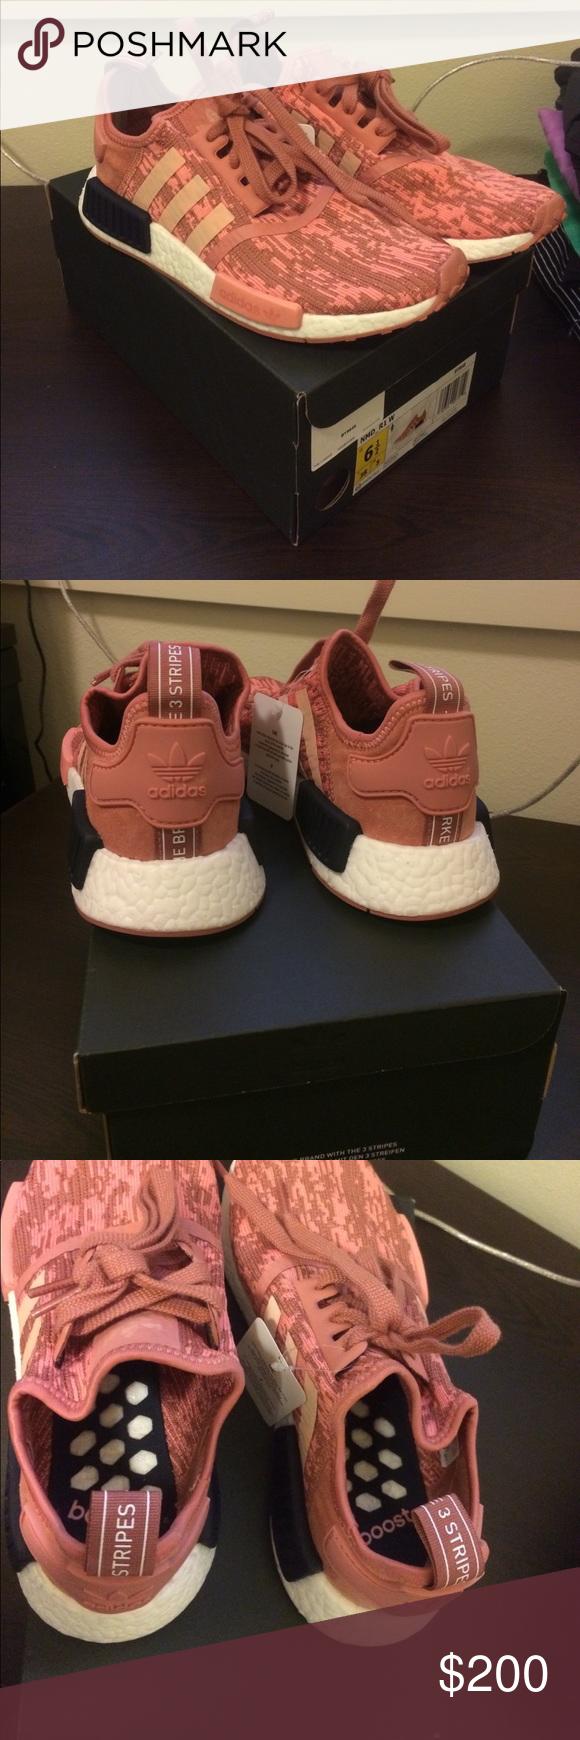 Adidas nmd r1 nwt (raw rosa / traccia rosa / leggenda inchiostro) raro salmone